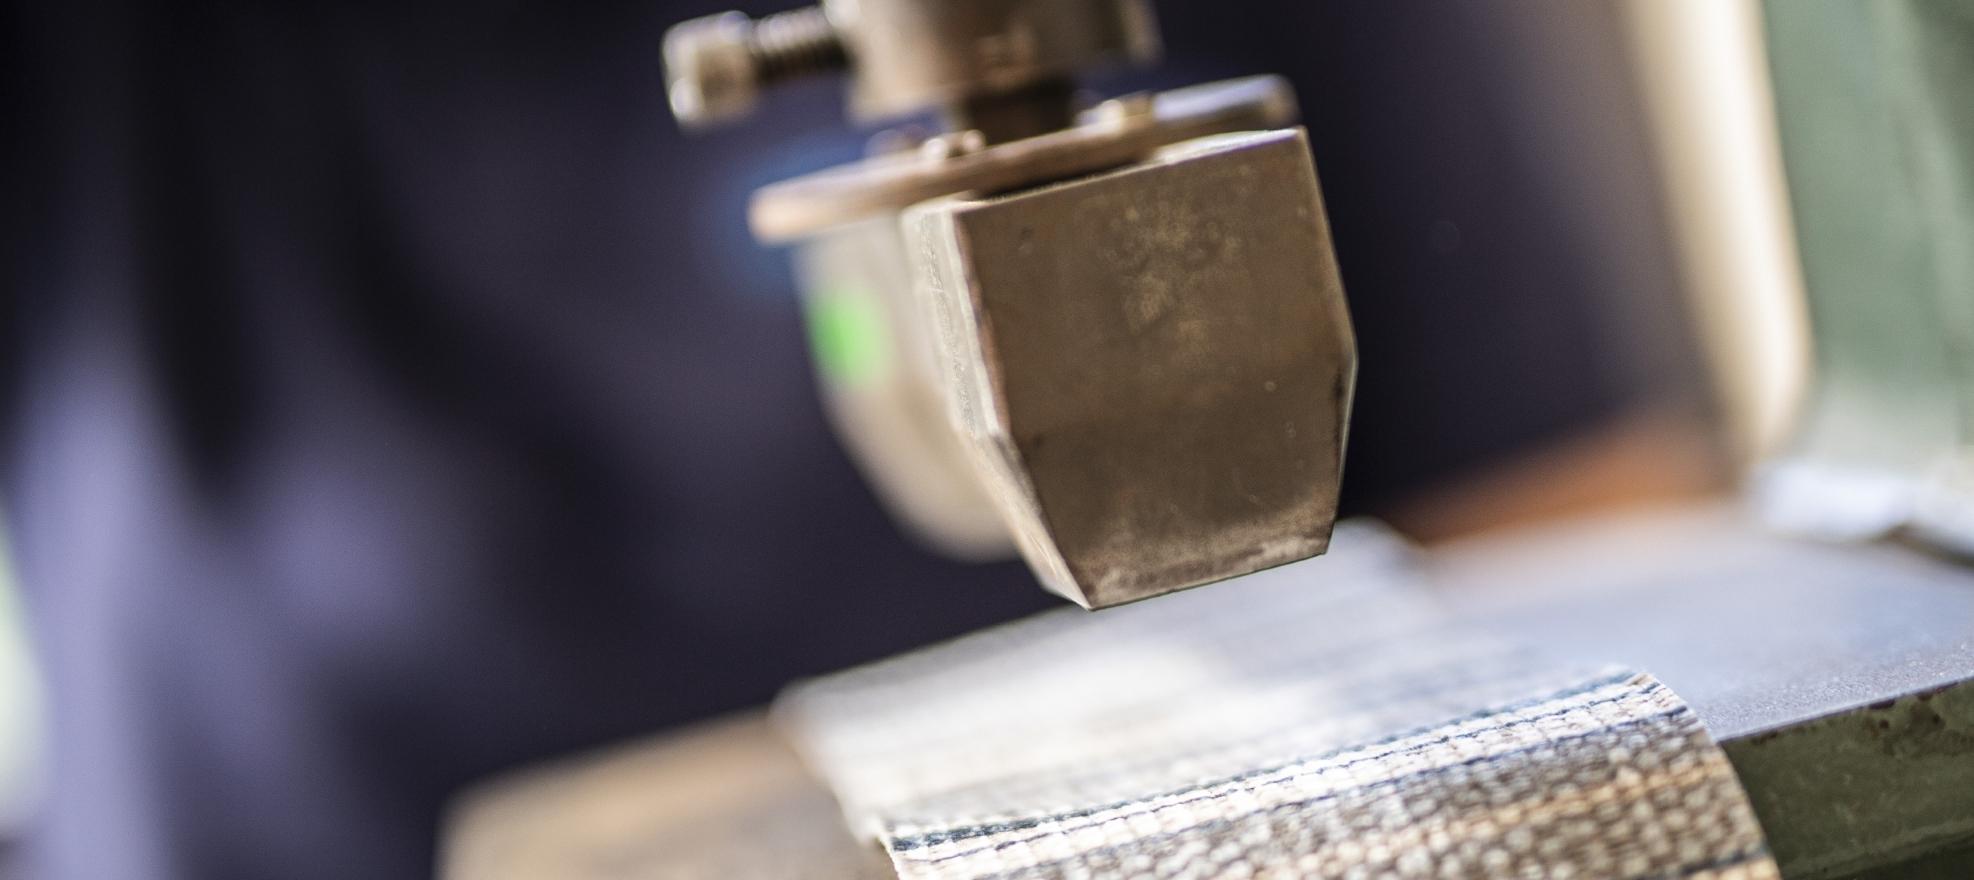 textile-testing-3.jpg#asset:327660